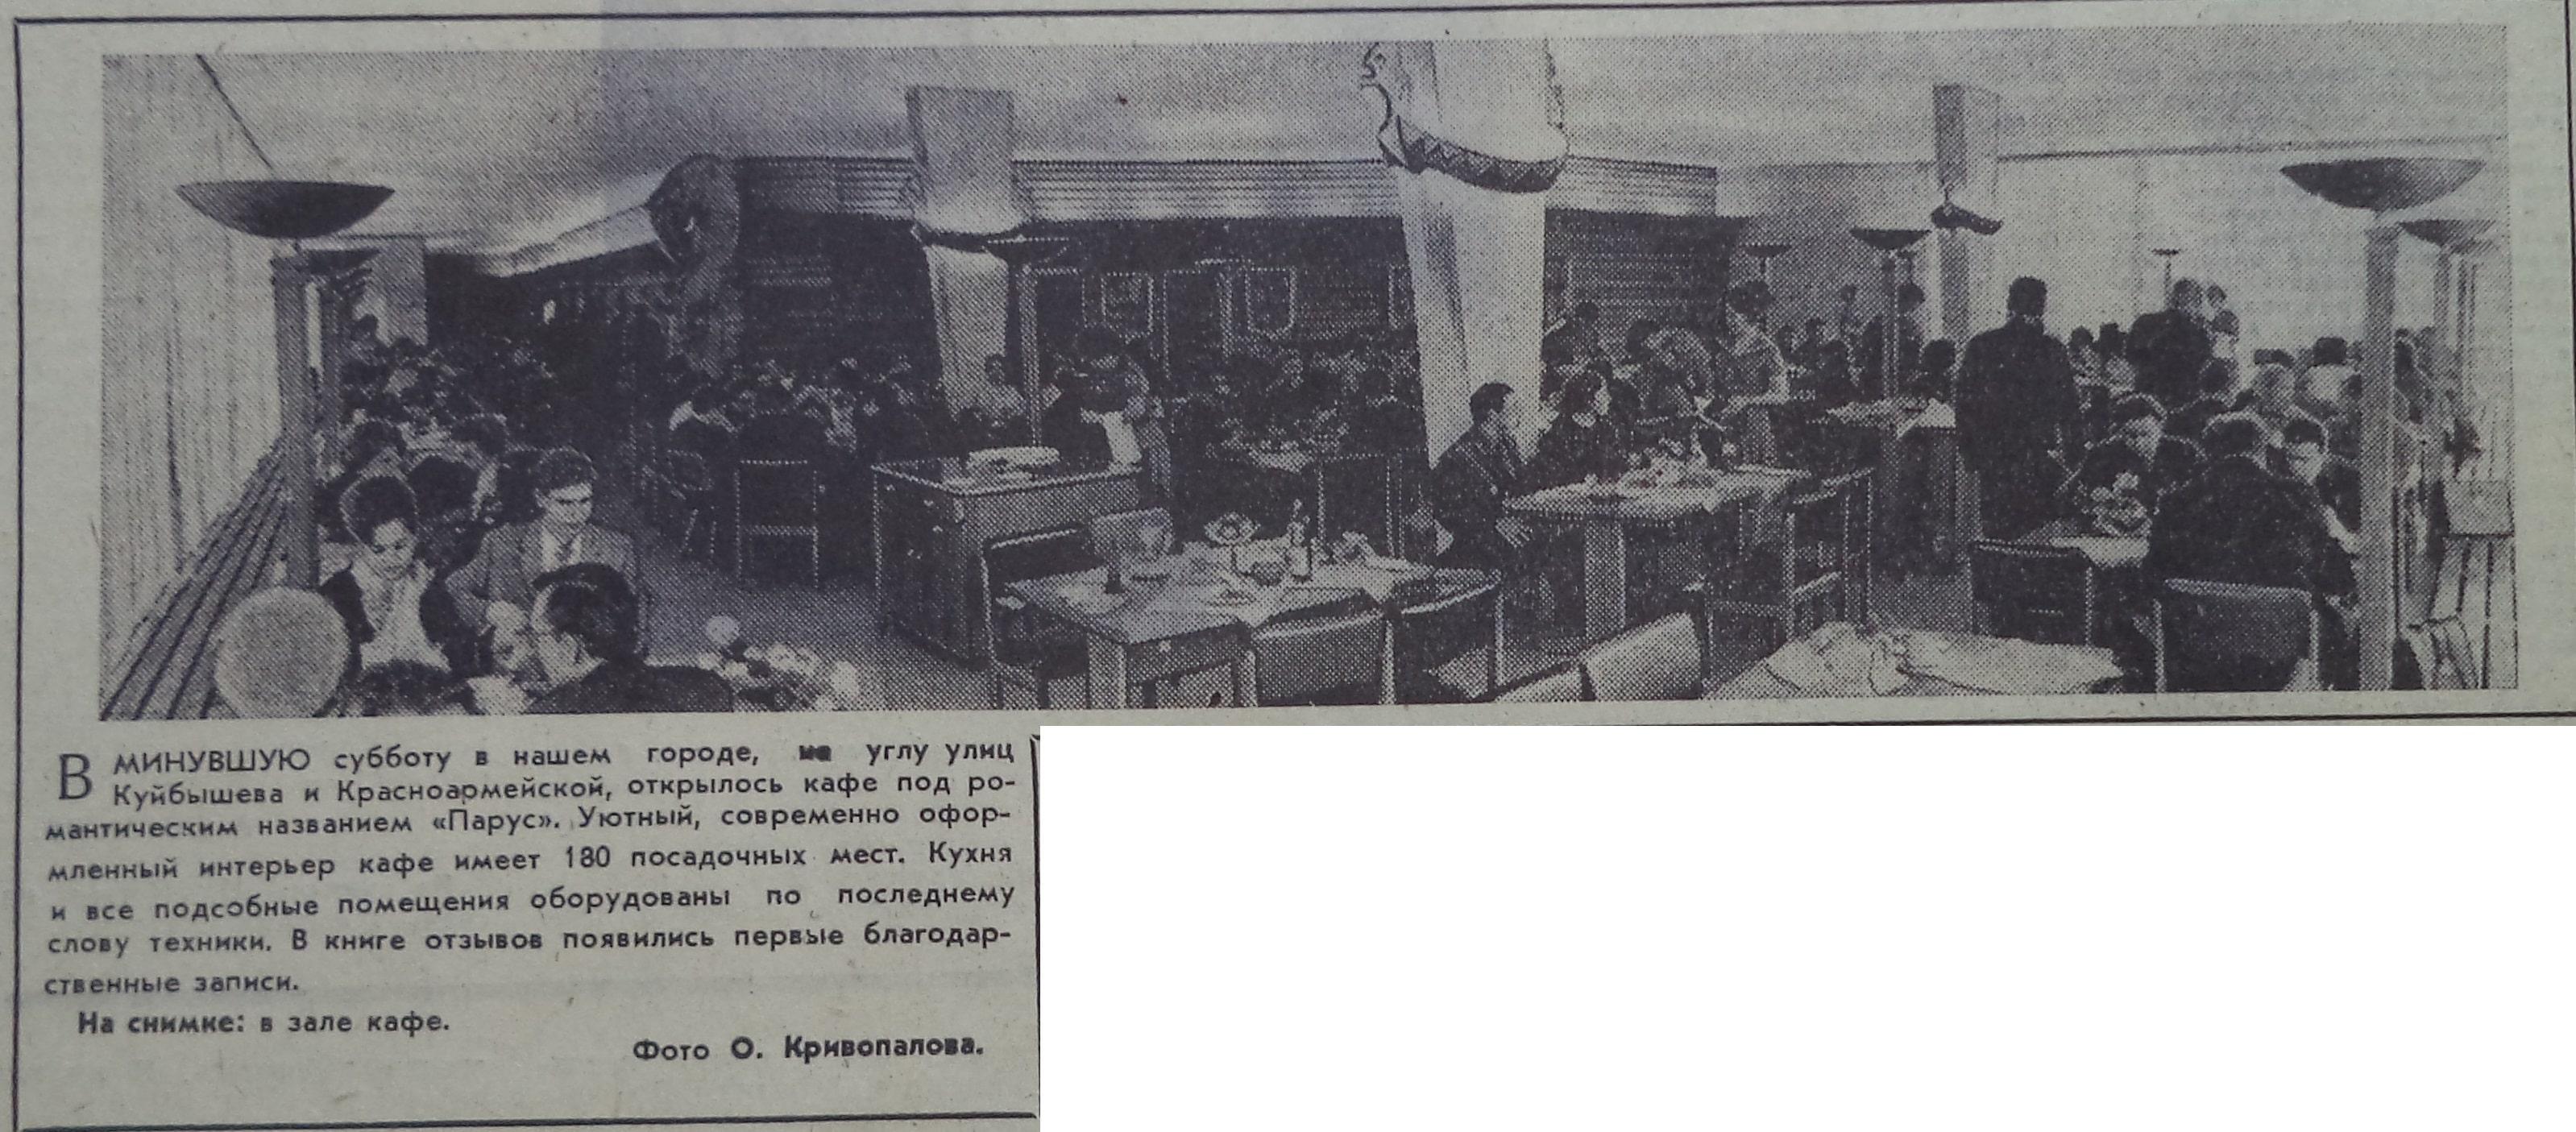 18 апреля 1972 года ресторан Парус